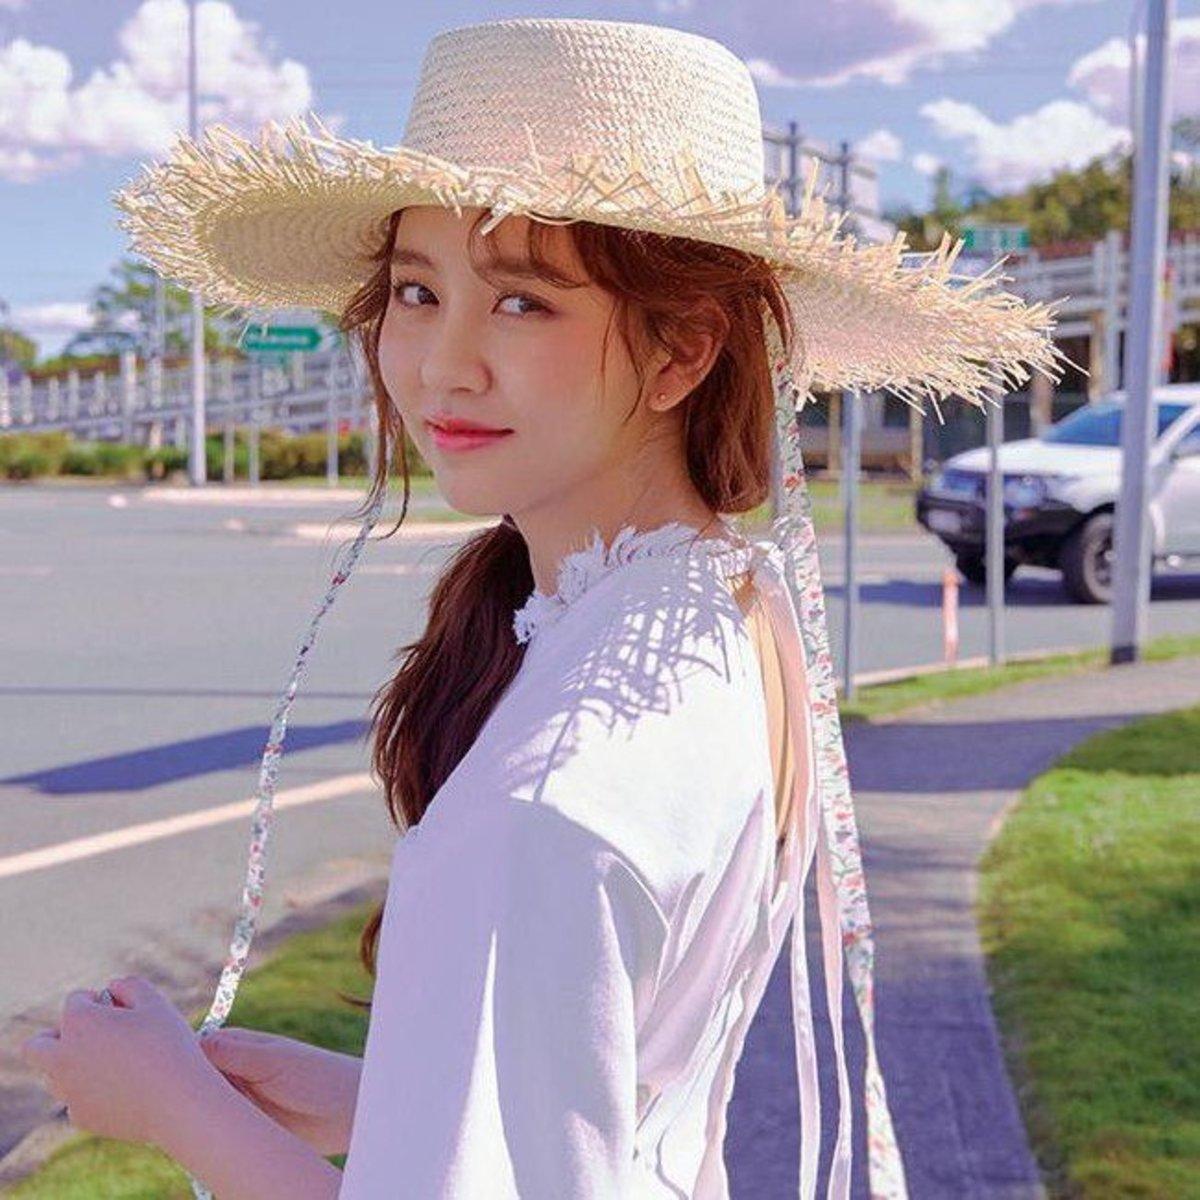 15 Best Dramas of Kim So Hyun